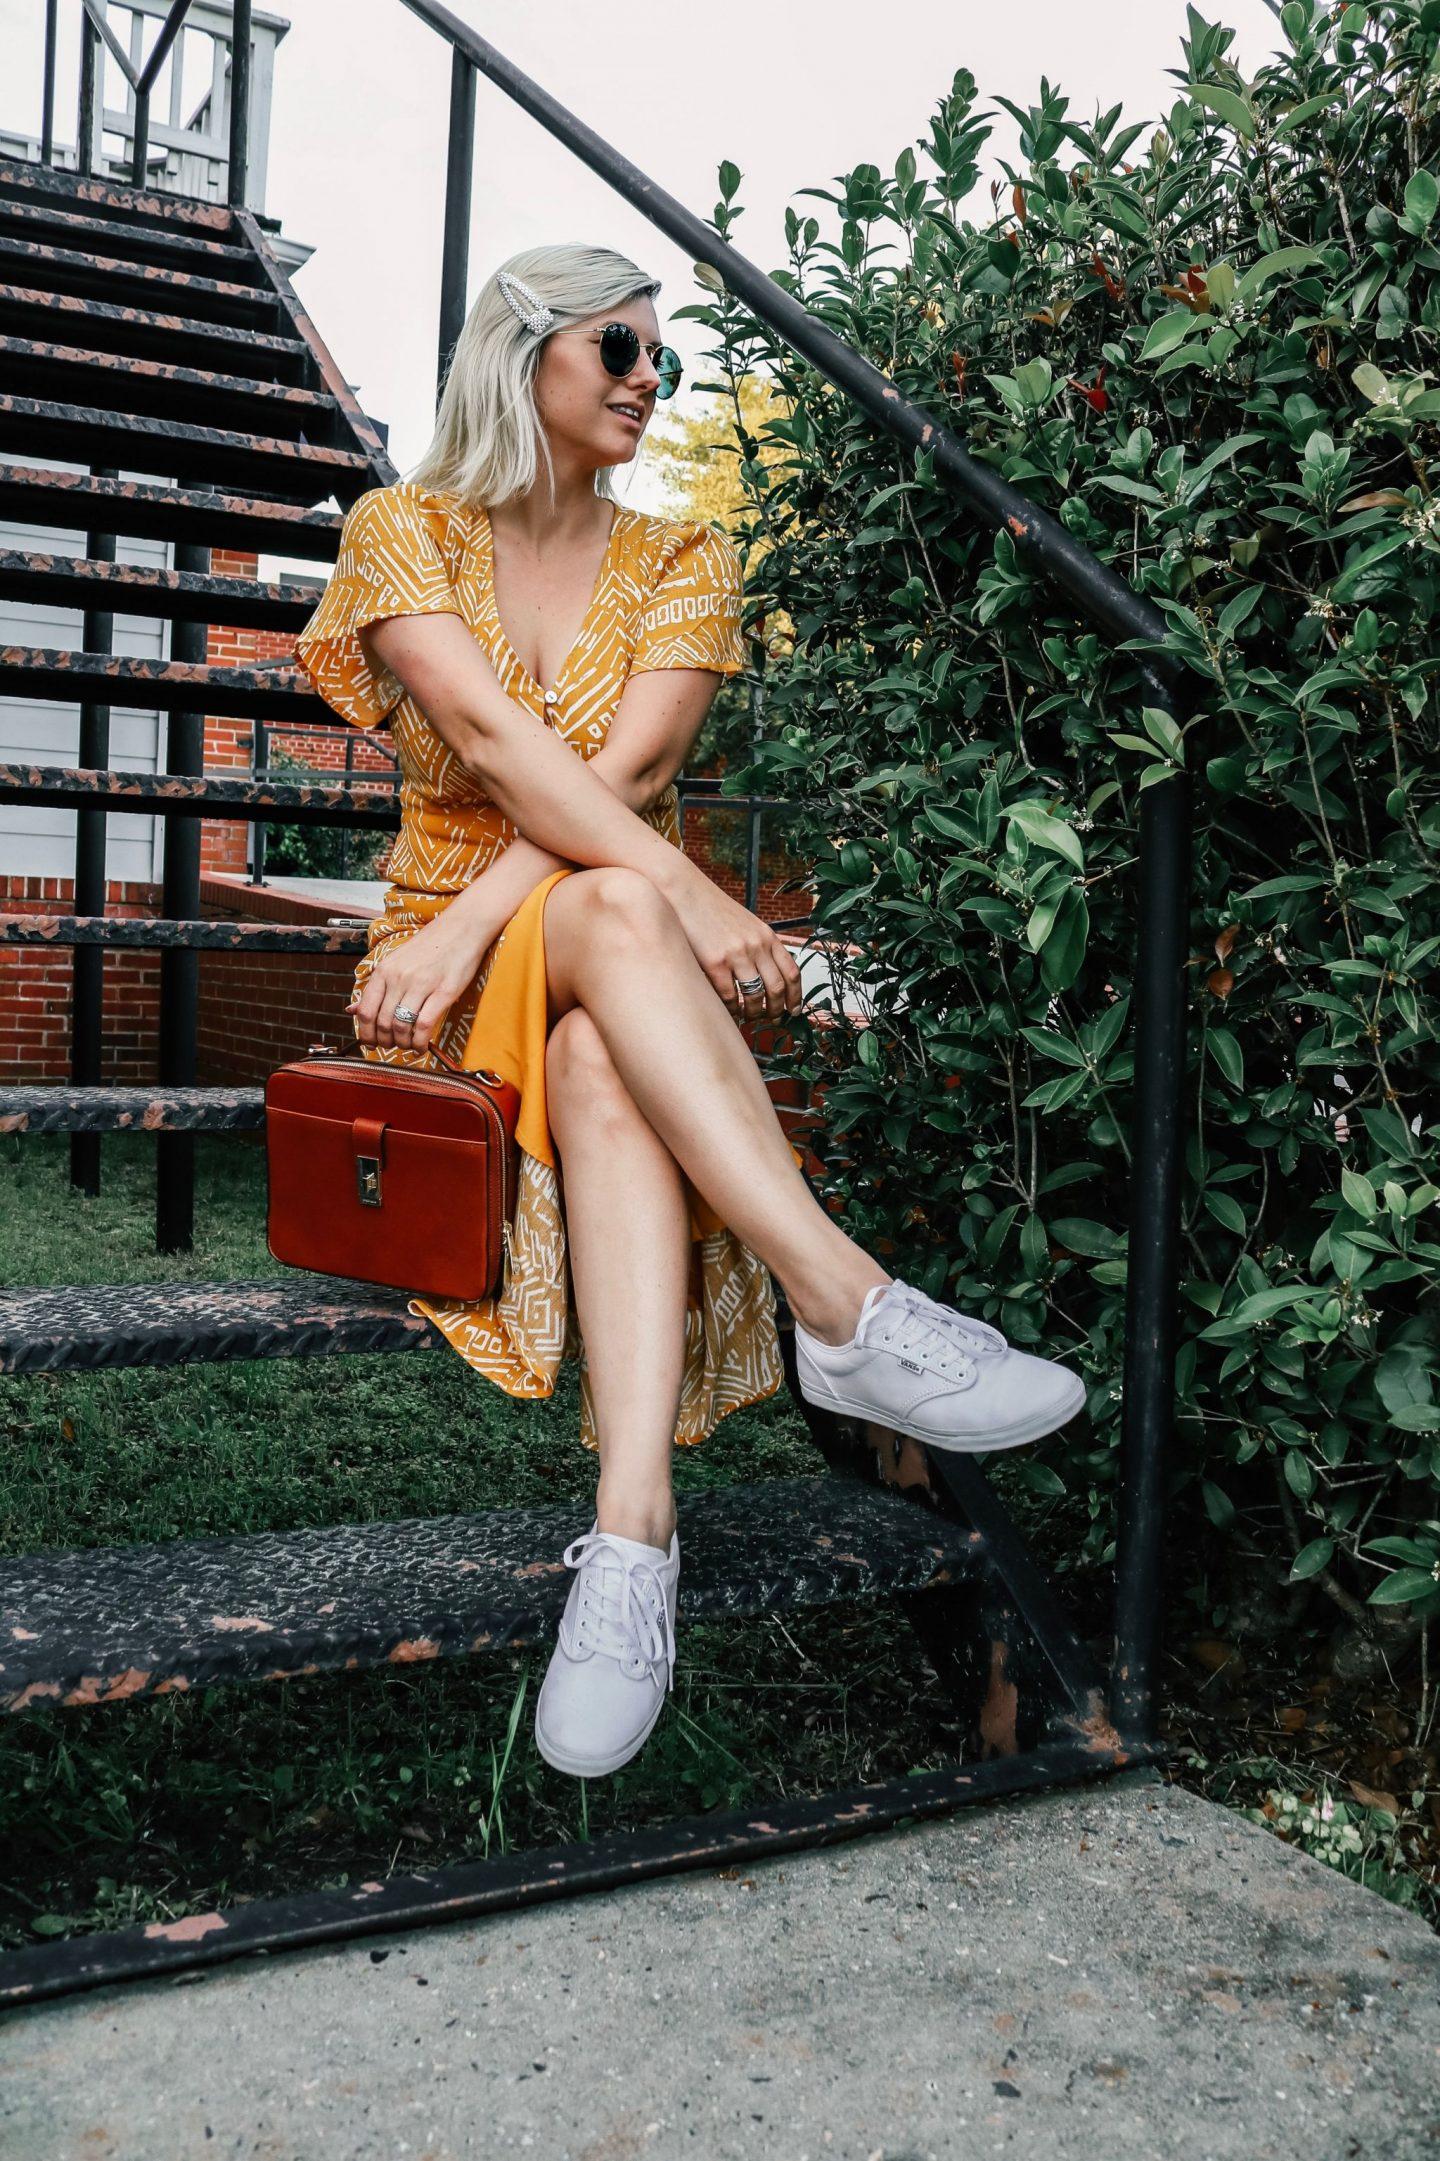 brahmin Evie bag, Evie bag, tripod photography, shooting content